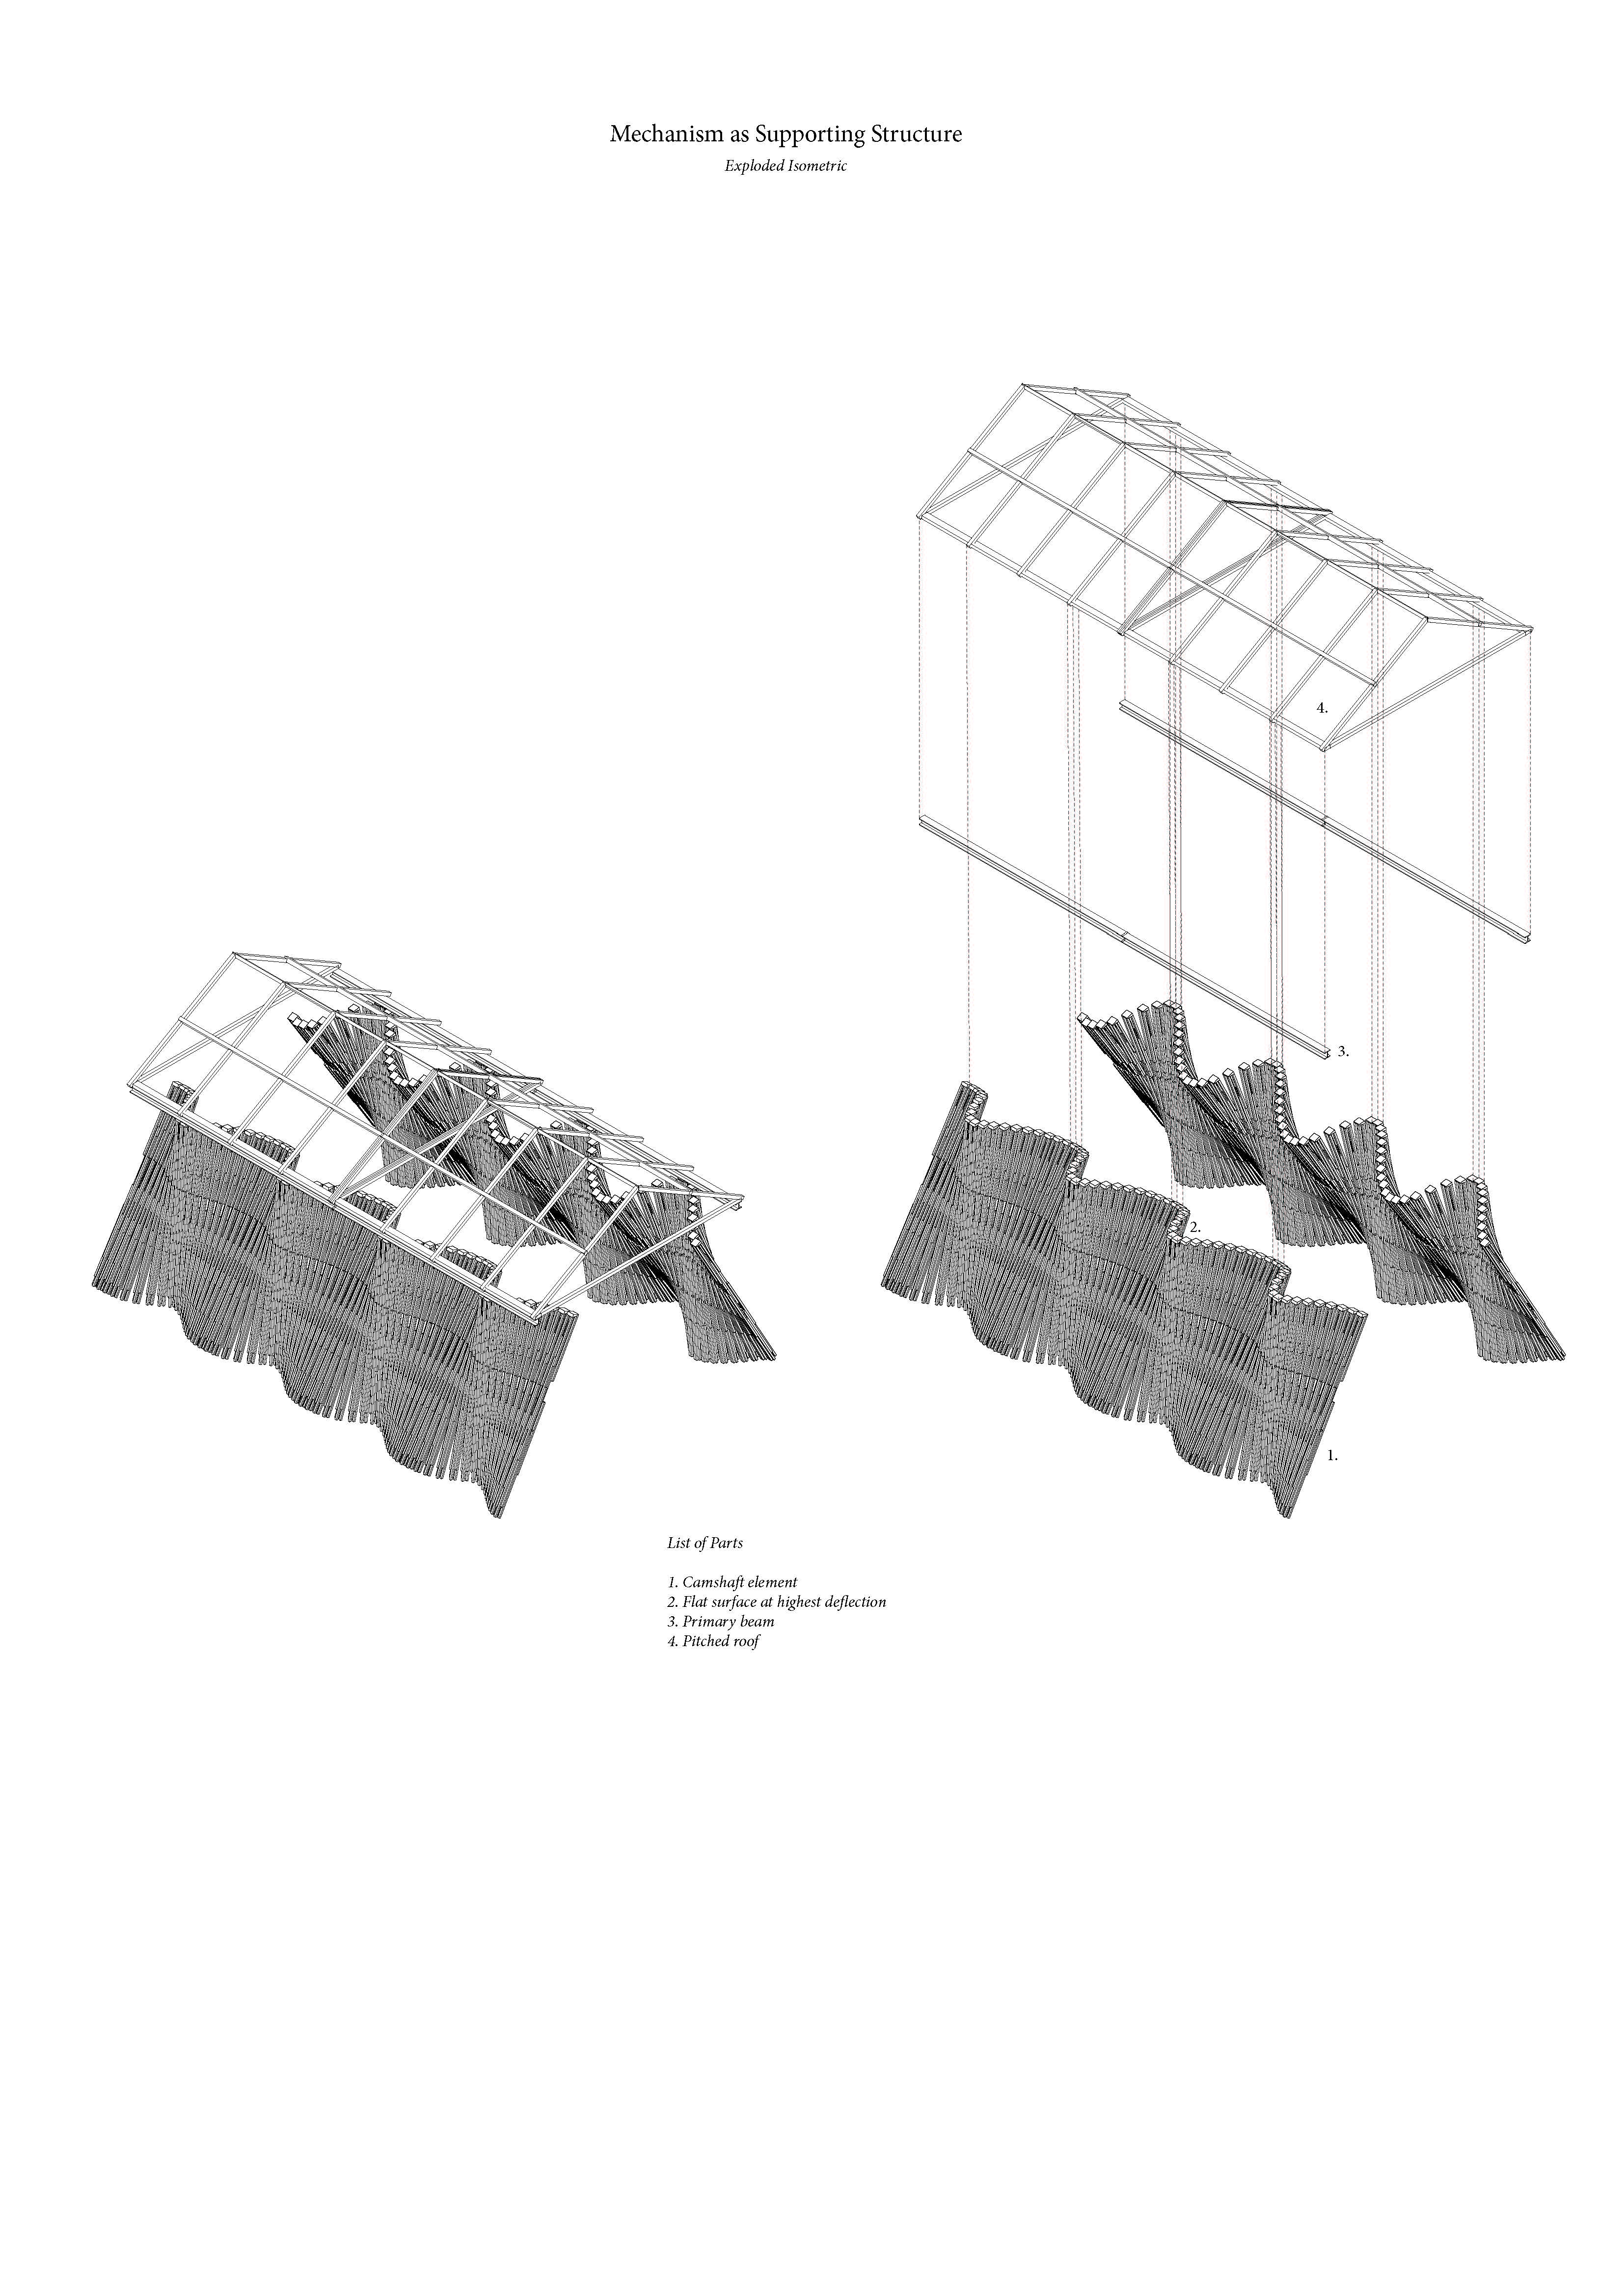 20170203 - Frank - Phase 2 - Element Plates 05